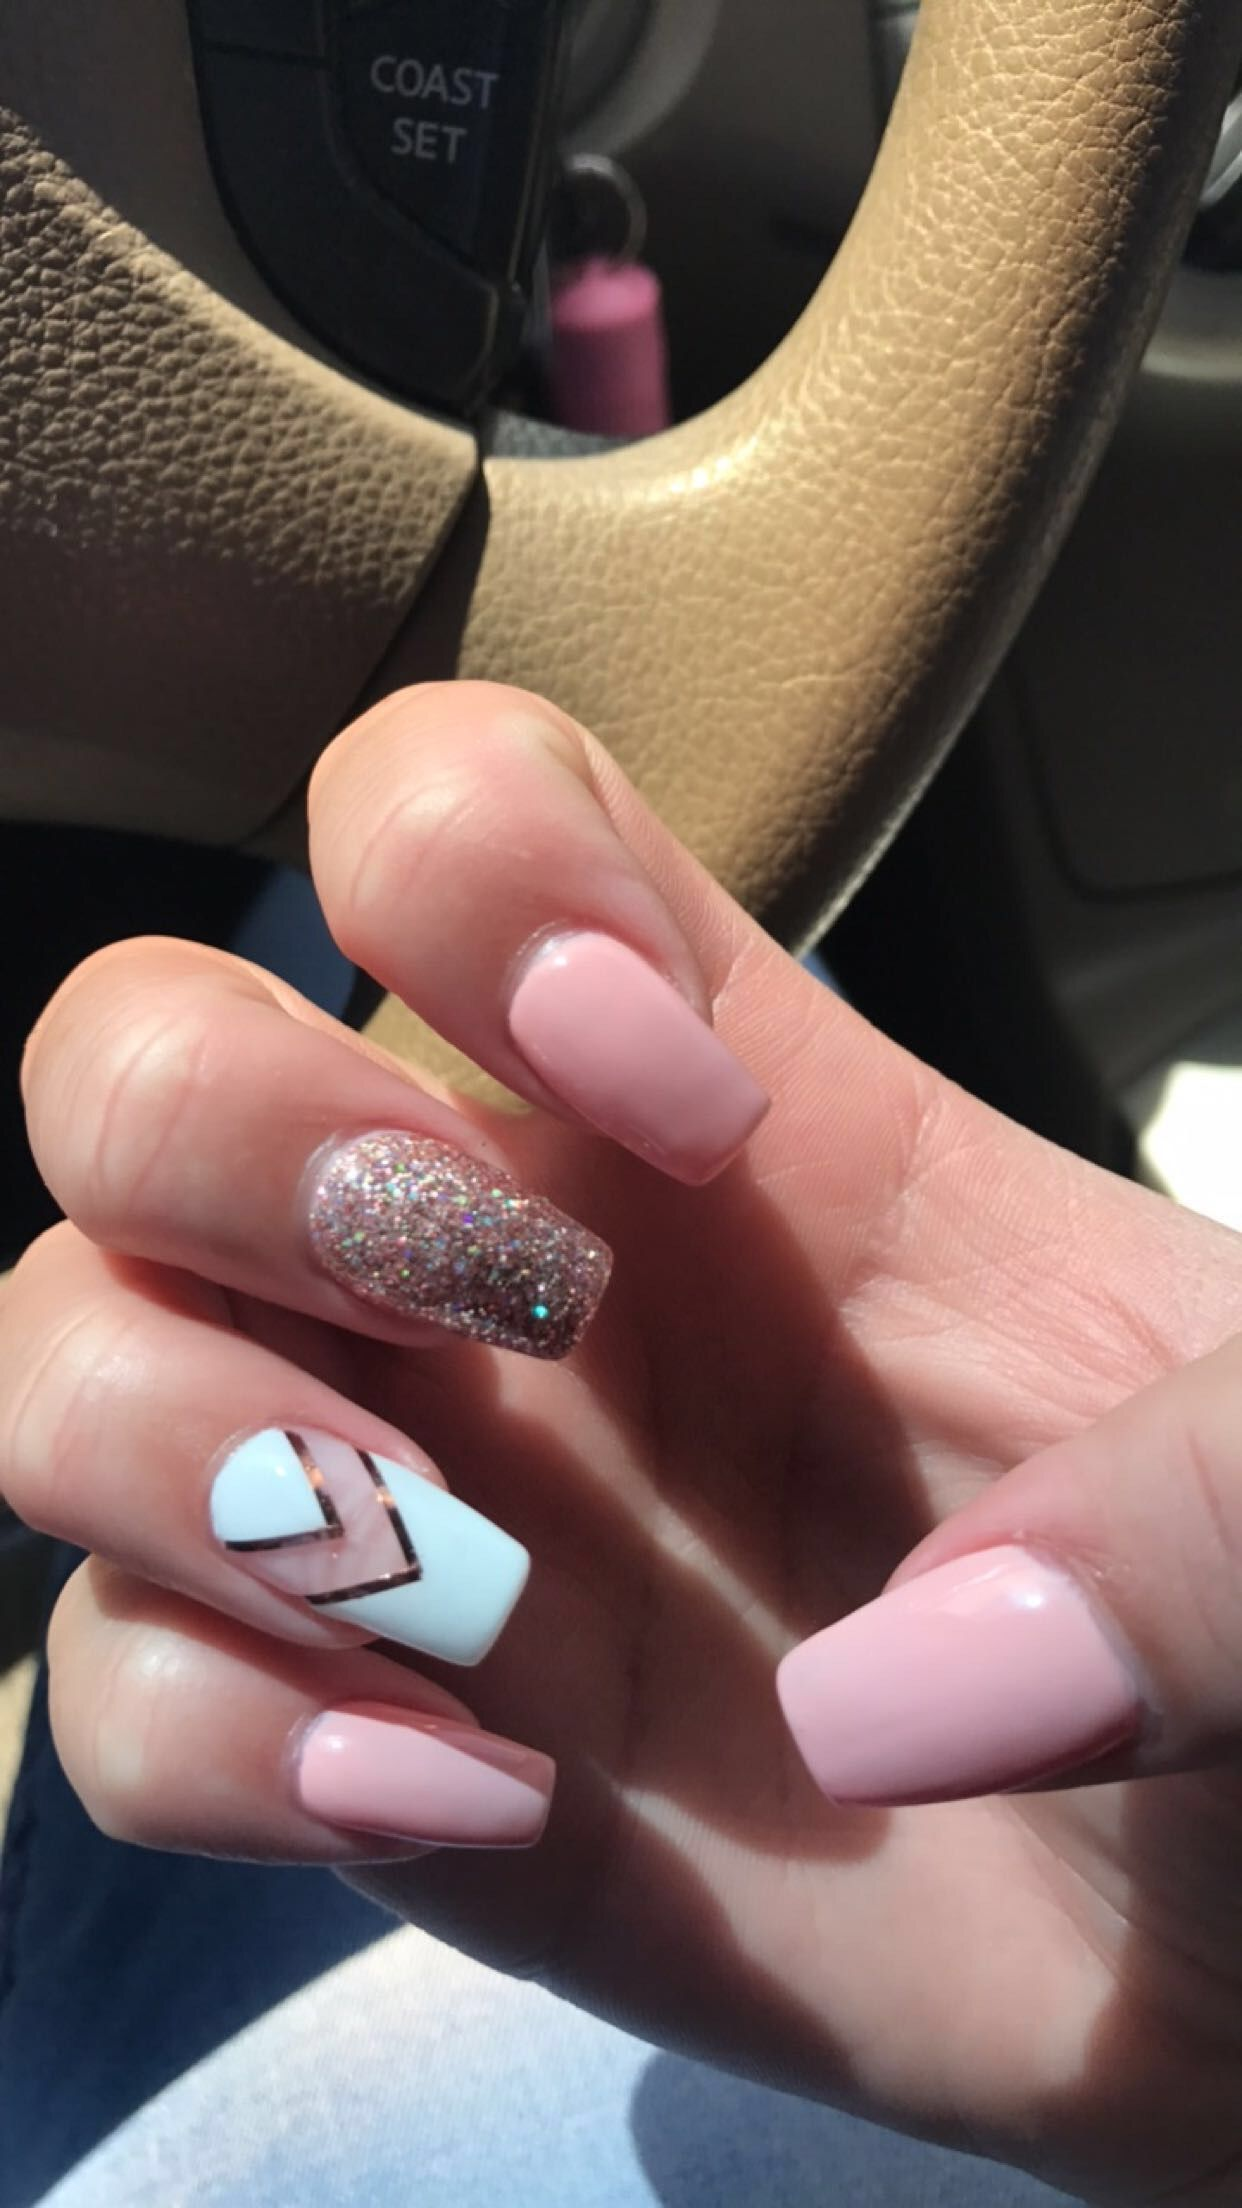 Instagram Photo By Nailsbysab Apr 17 2016 At 6 22pm Utc Pink Glitter Nails Instagram Nails Pink Nails